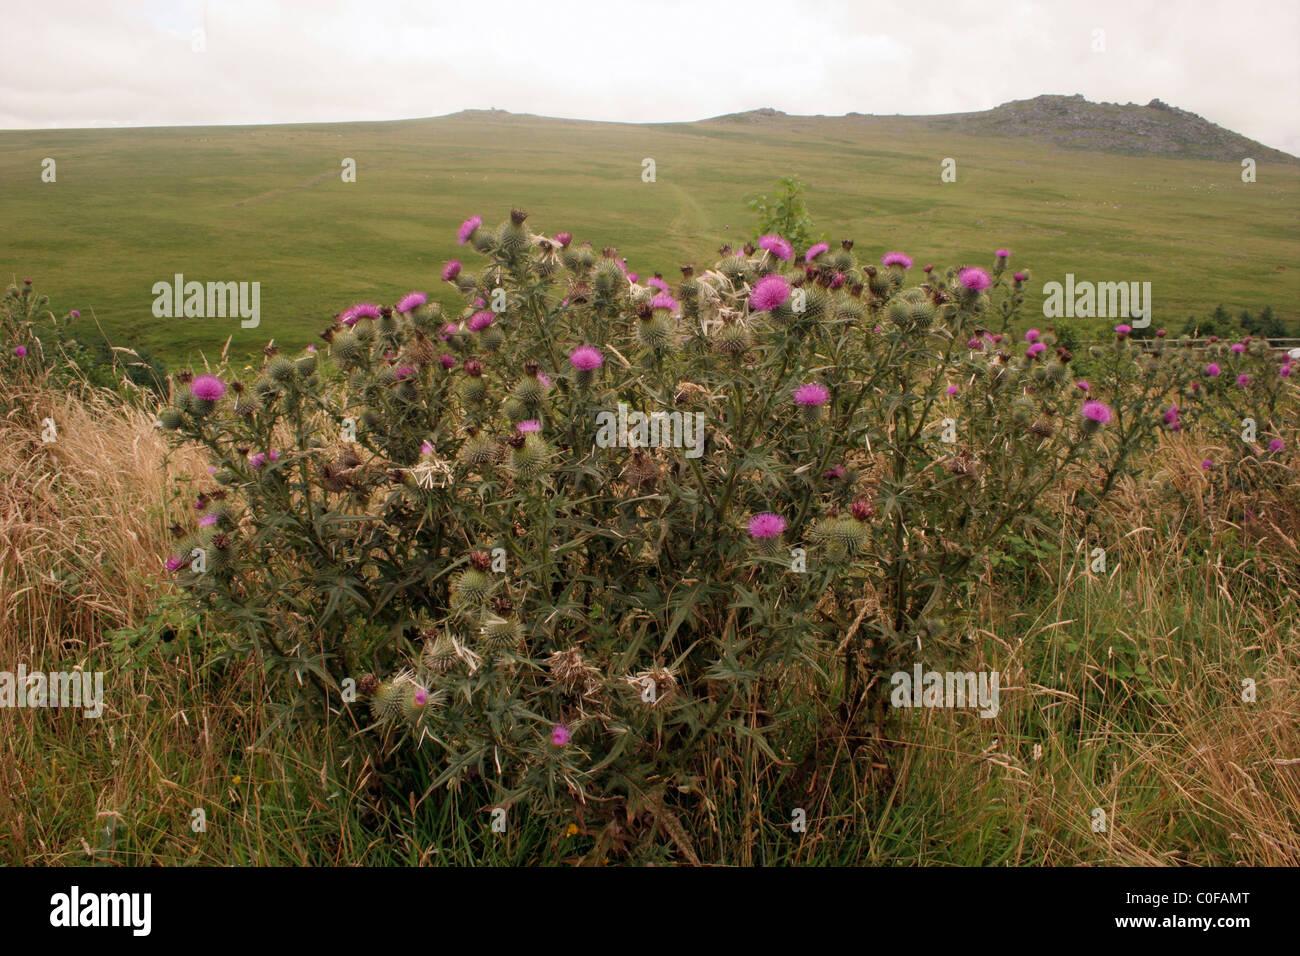 Spear thistle (Cirsium vulgare : Asteraceae), on moorland, UK - Stock Image